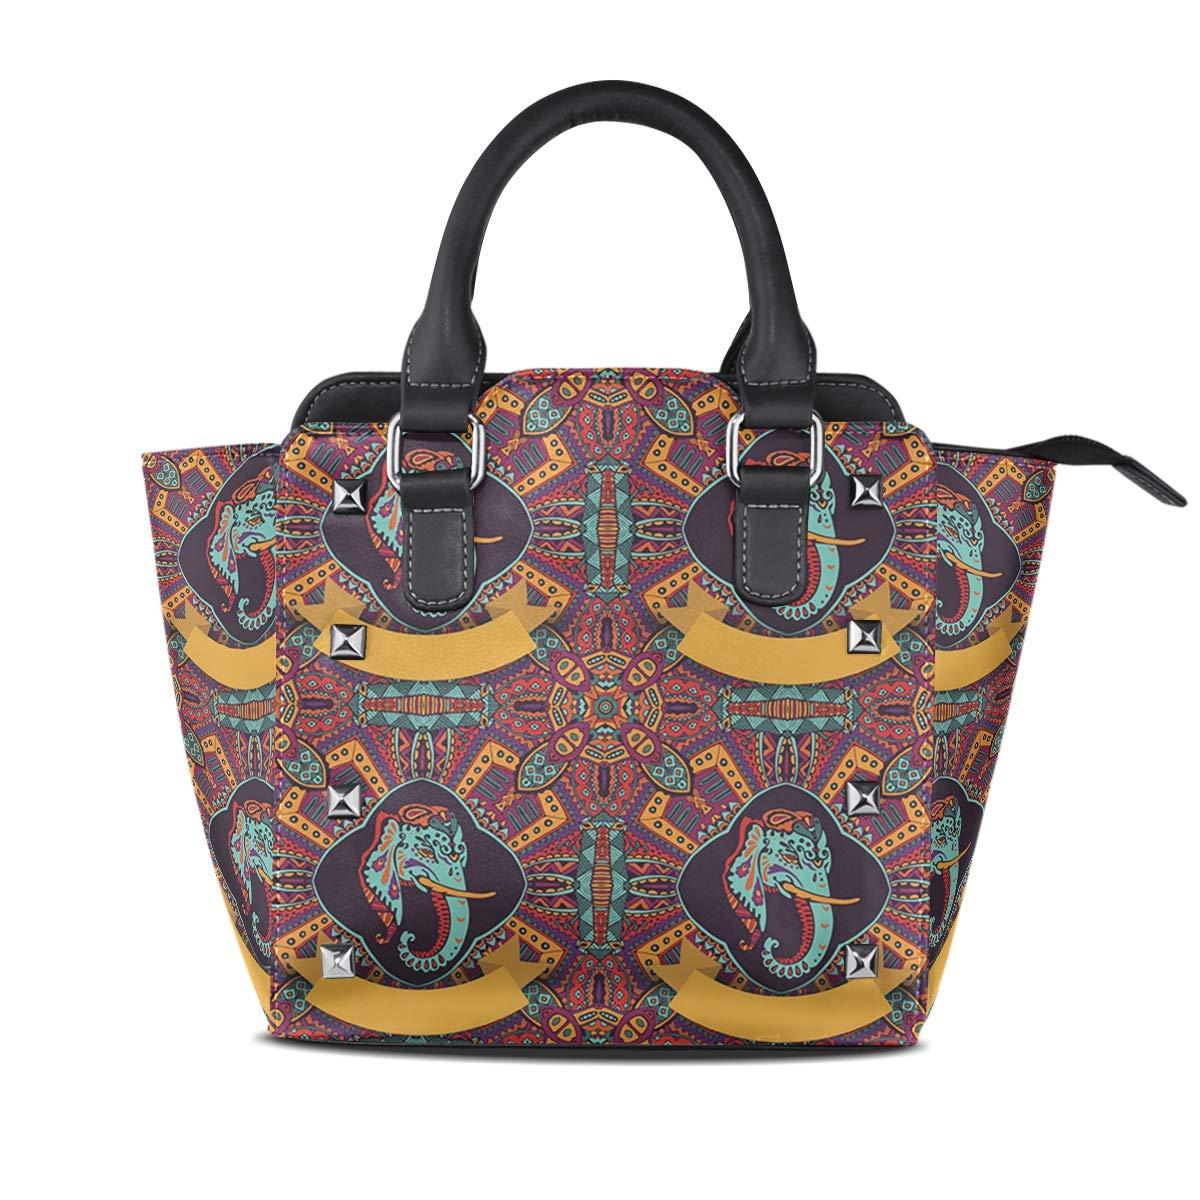 Design3 Handbag Tribal Style Elephant And Lotus Genuine Leather Tote Rivet Bag Shoulder Strap Top Handle Women